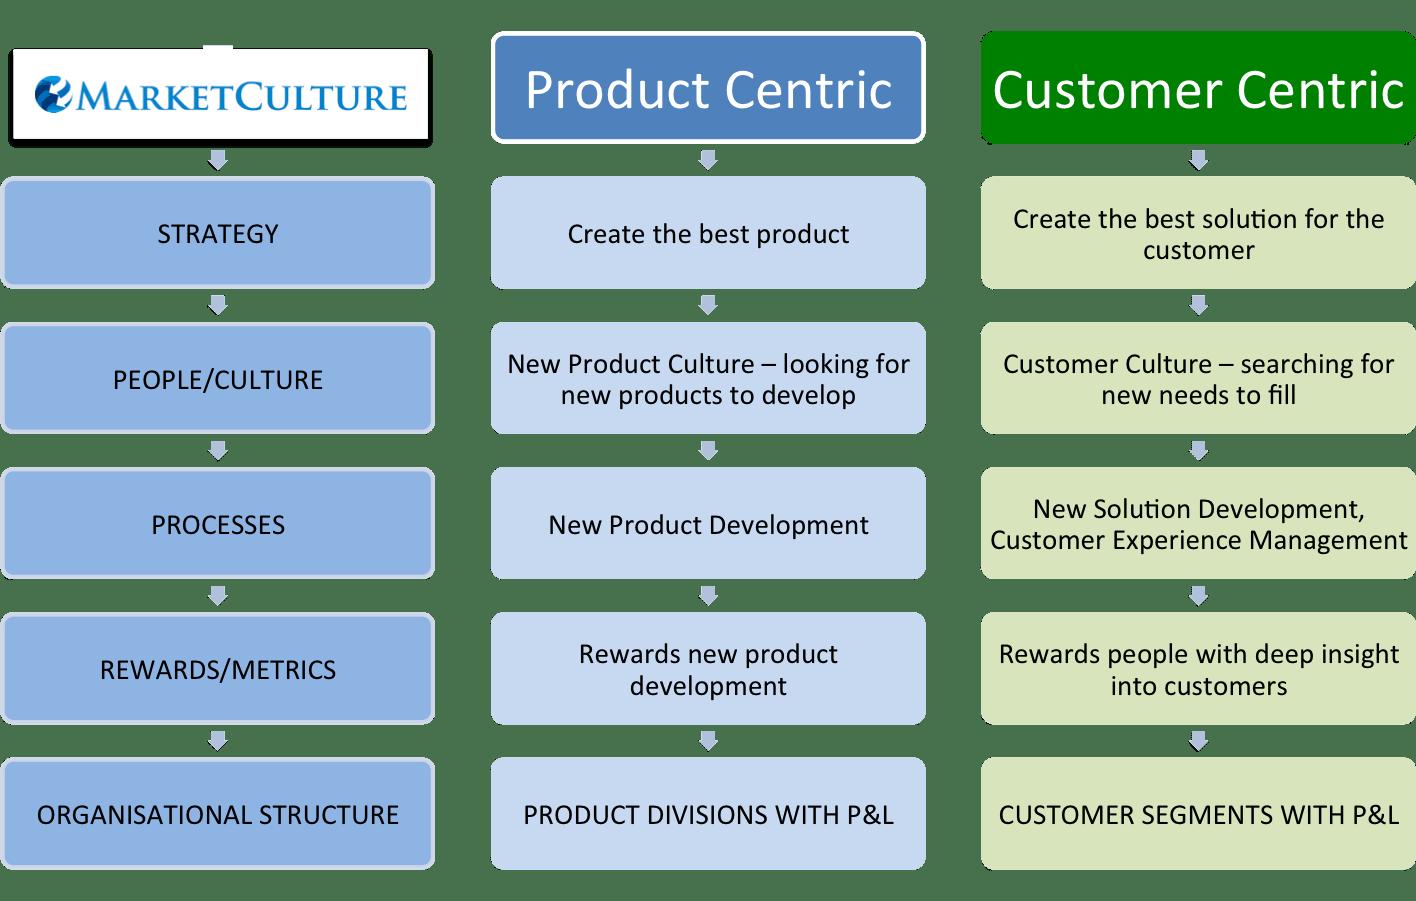 product versus customer-centric companies